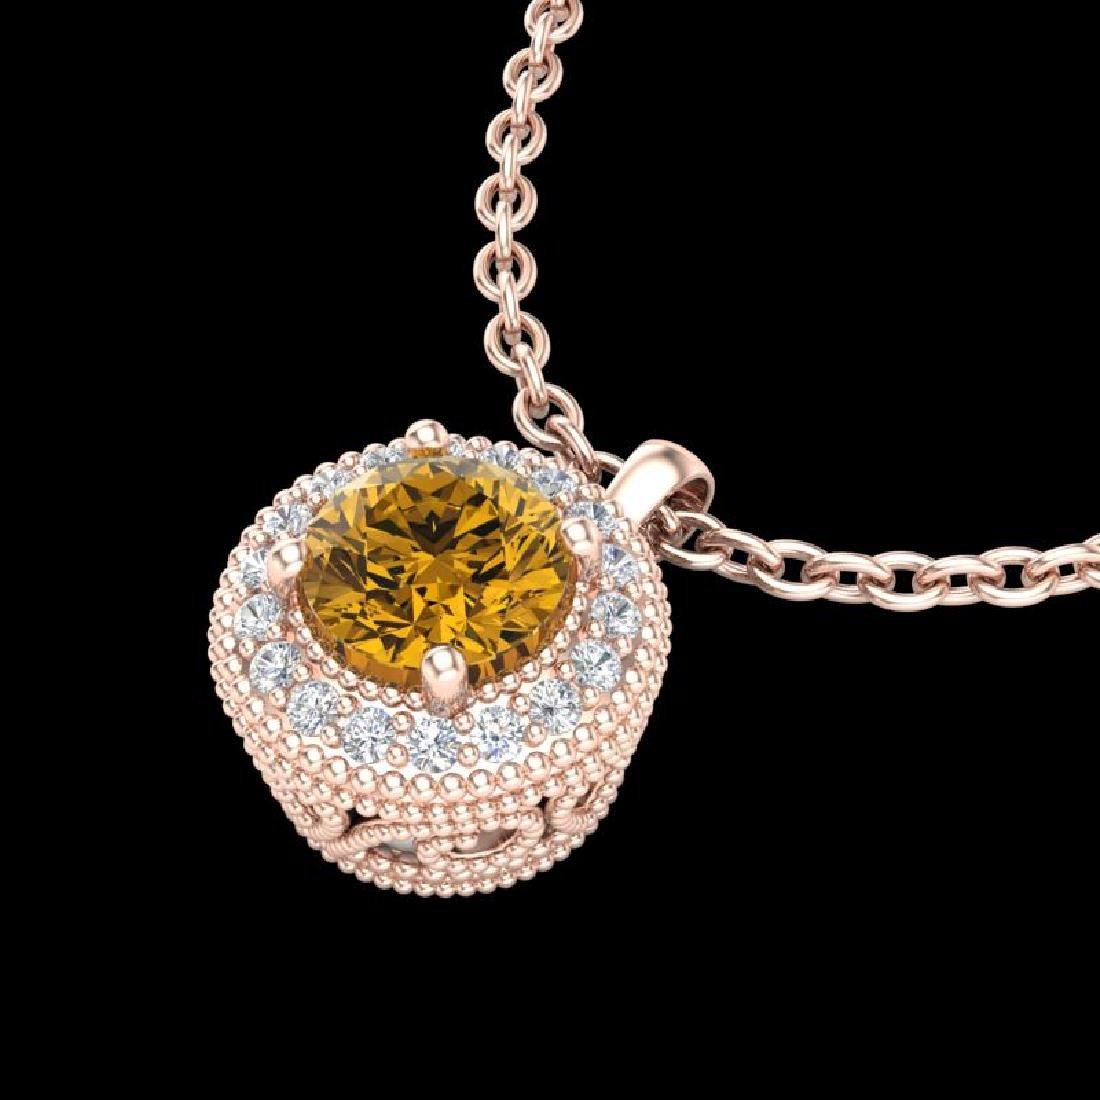 1 CTW Intense Fancy Yellow Diamond Solitaire Art Deco